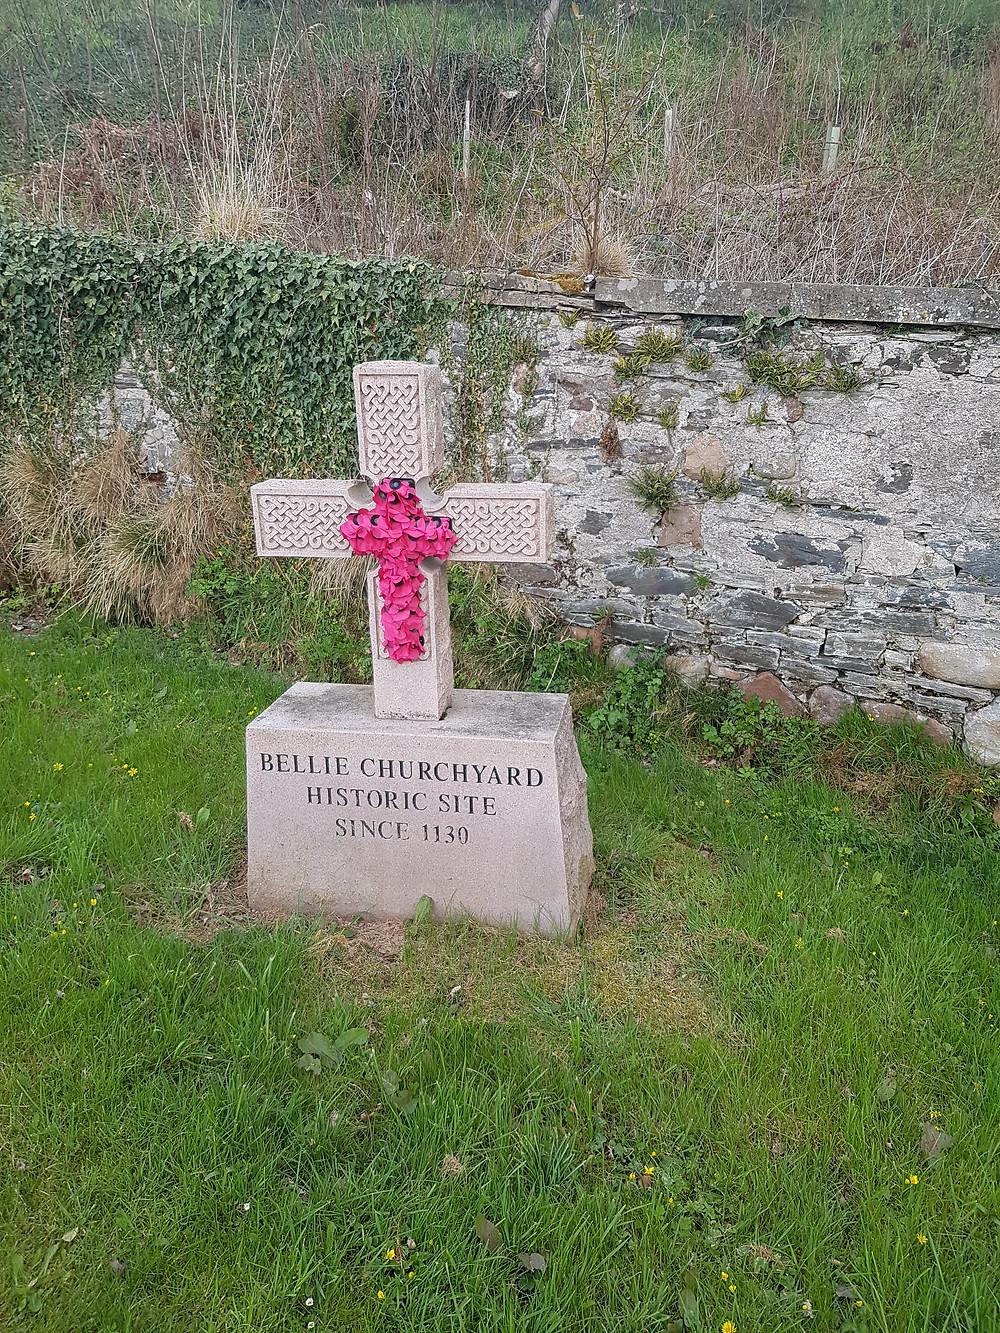 Bellie Churchyard